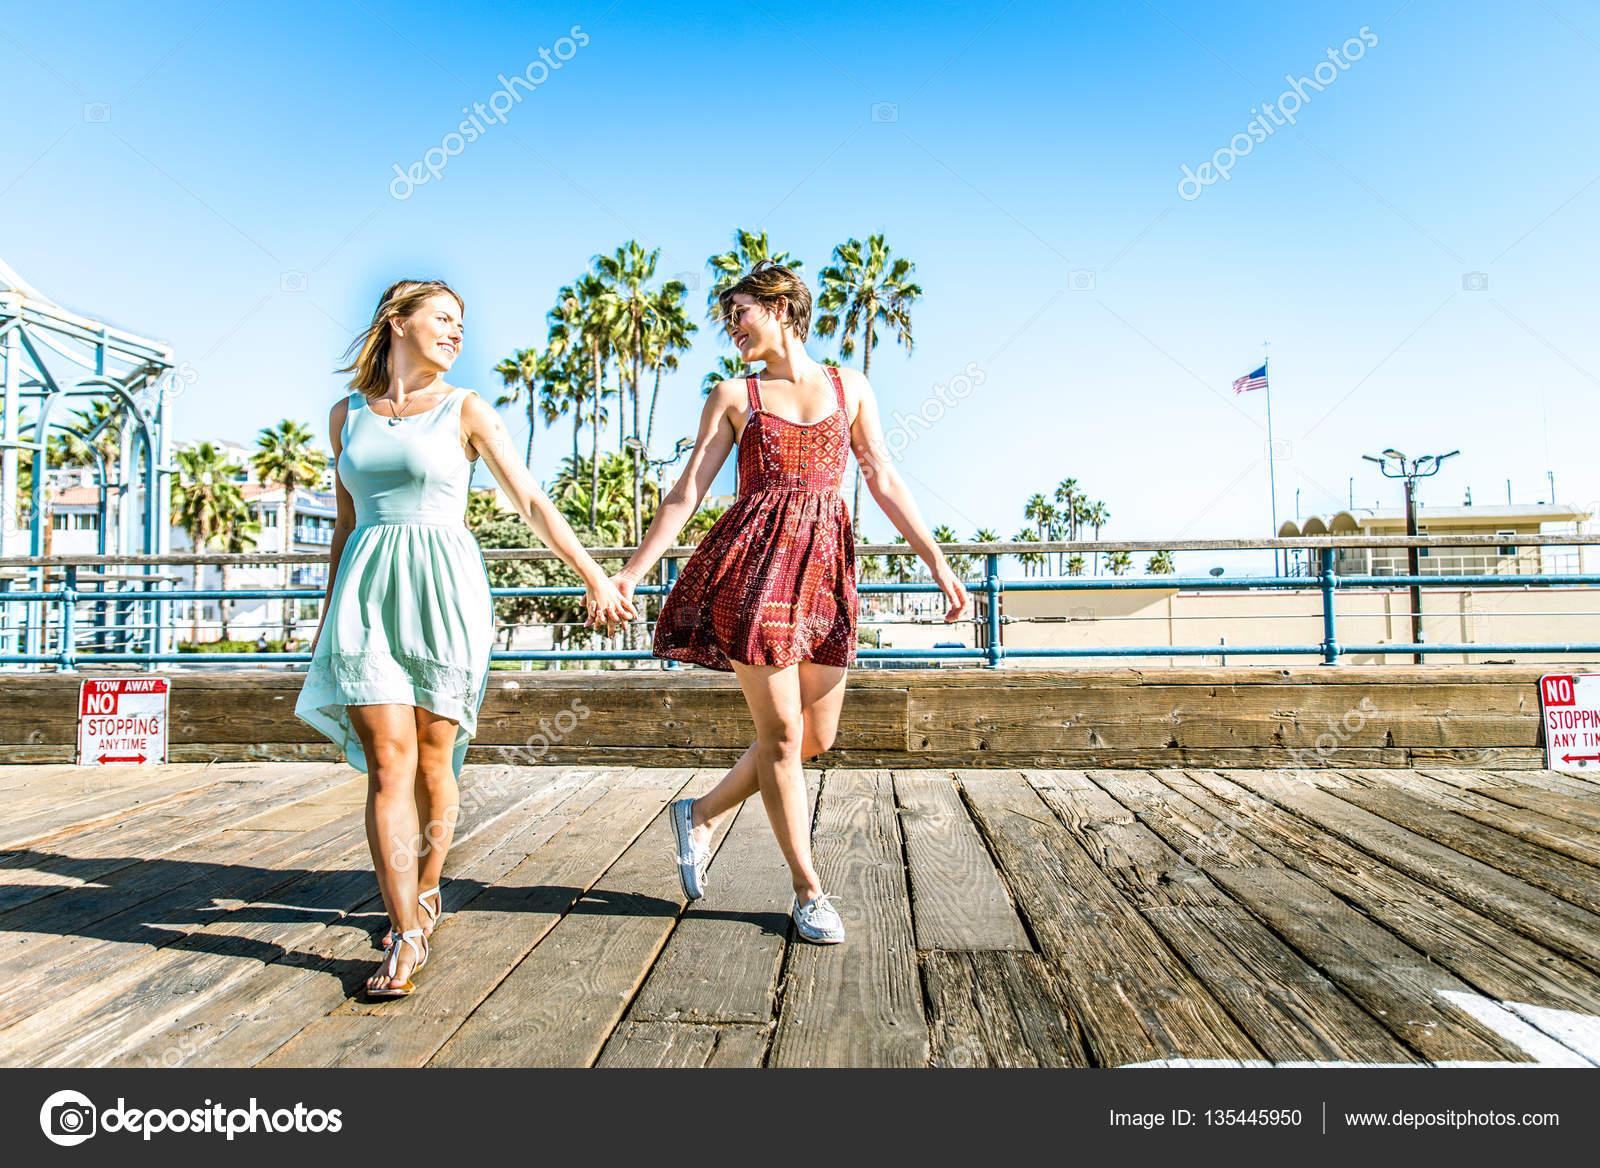 Lesbianz sexu naked images